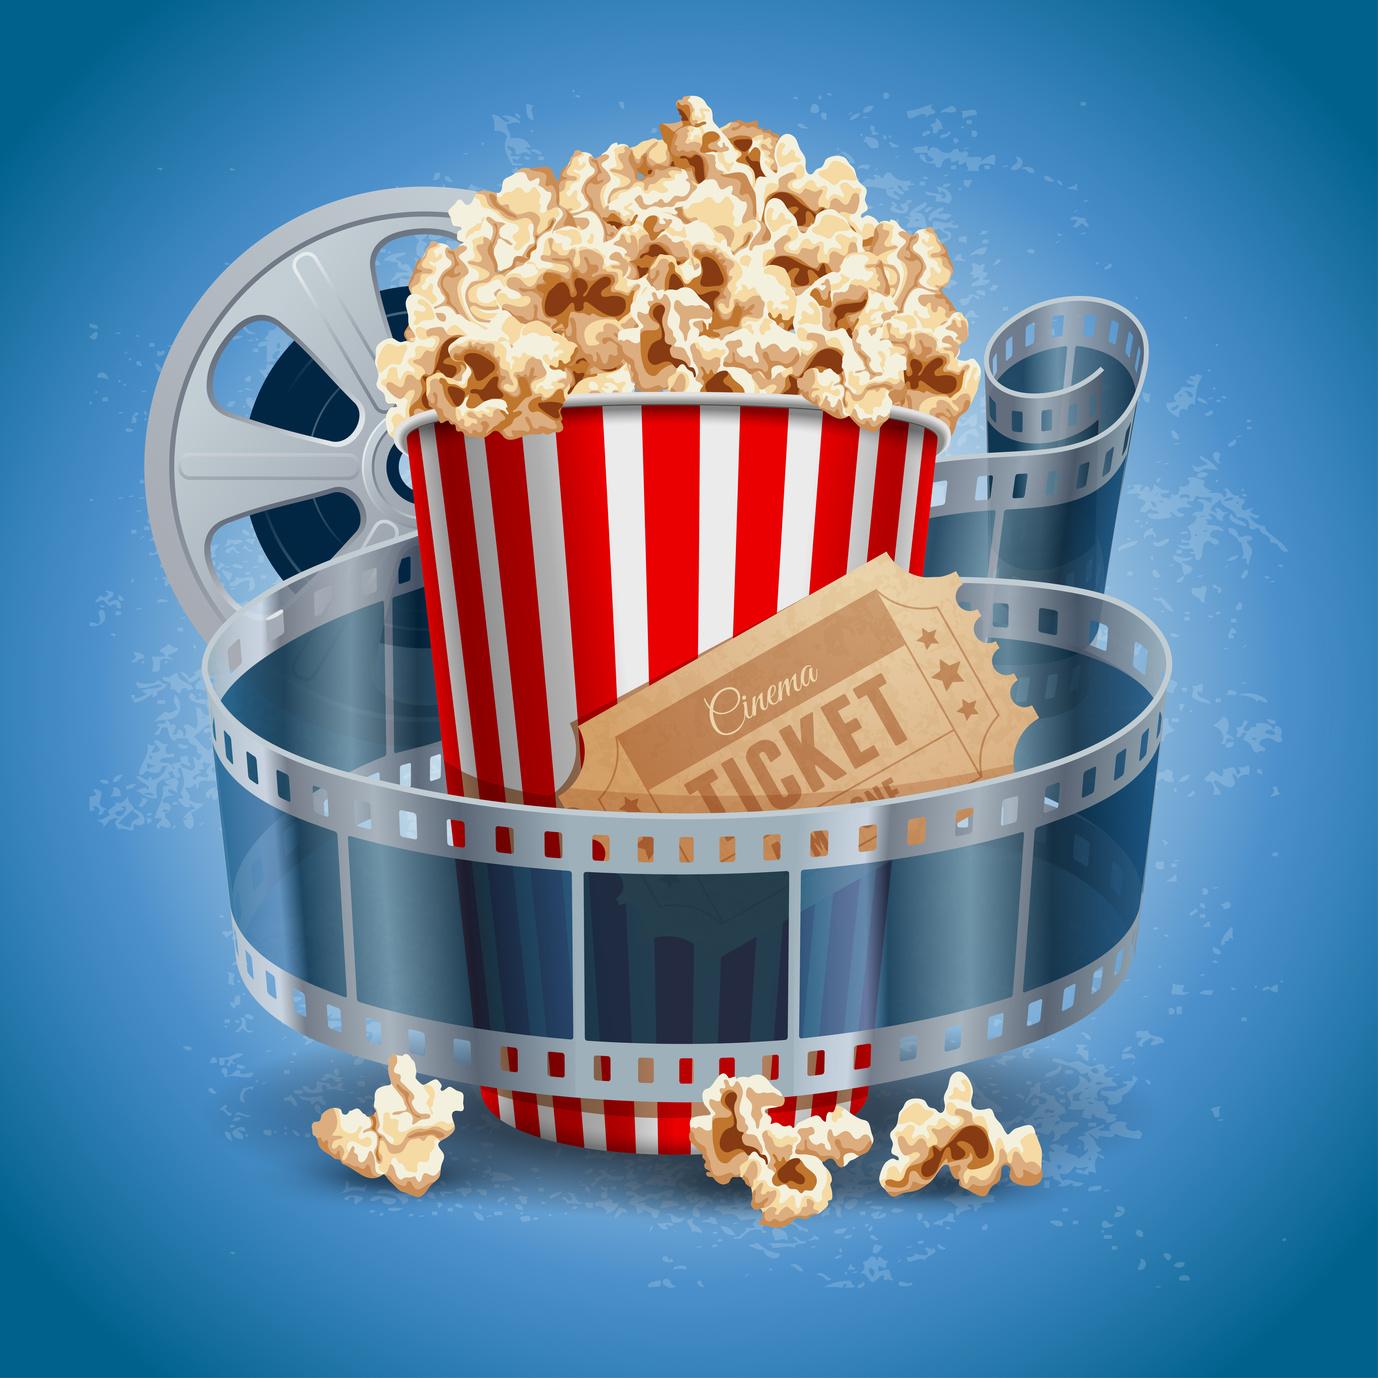 Popcorn movie posters